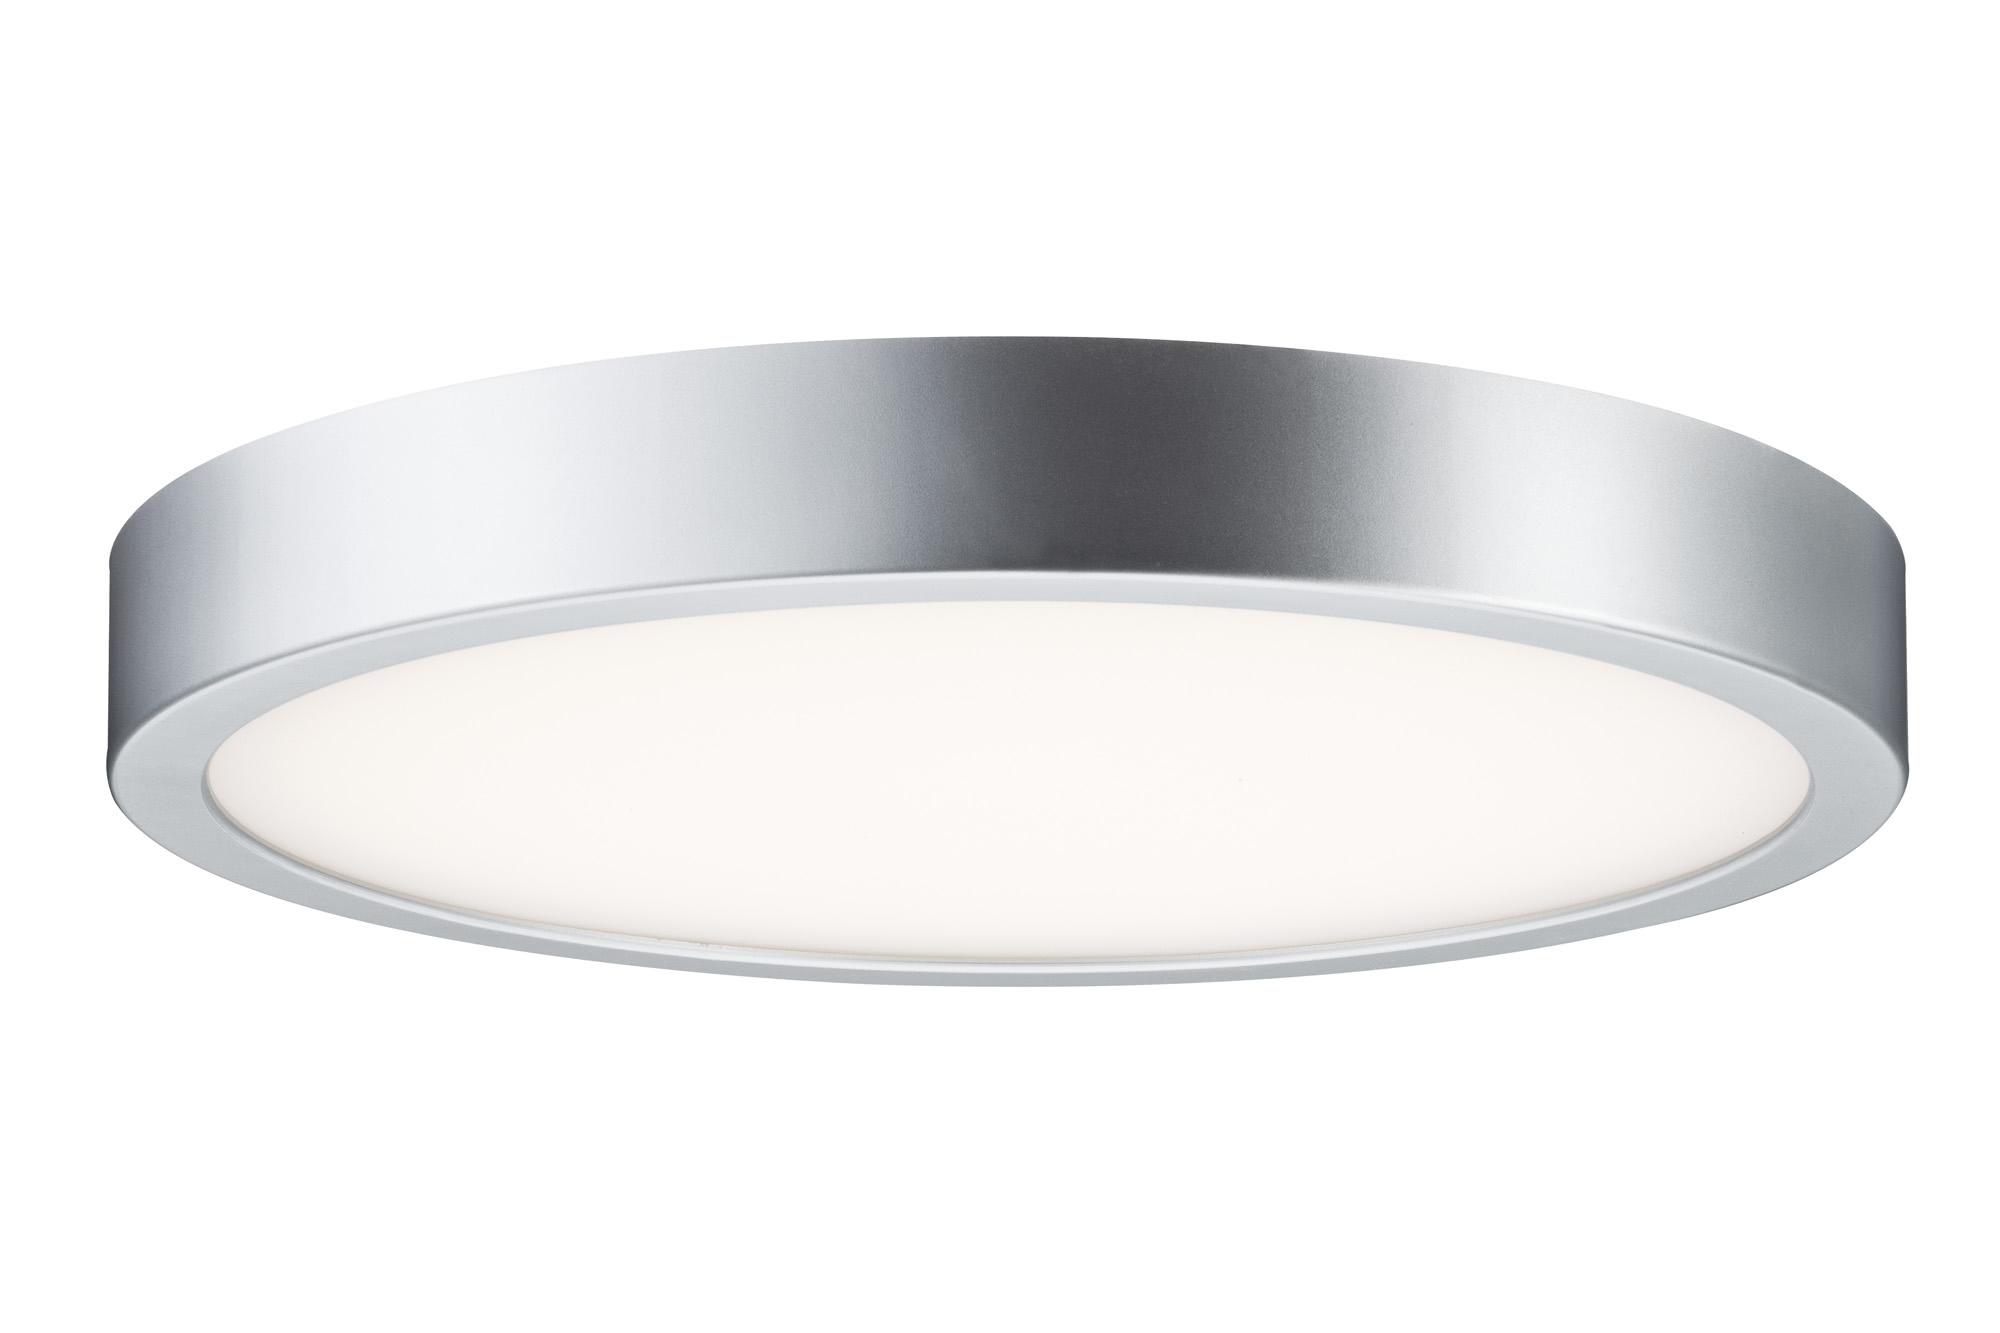 Paulmann. 70390 Светильник WD Orbit 18,5W LED-Panel 360mm Chr-m